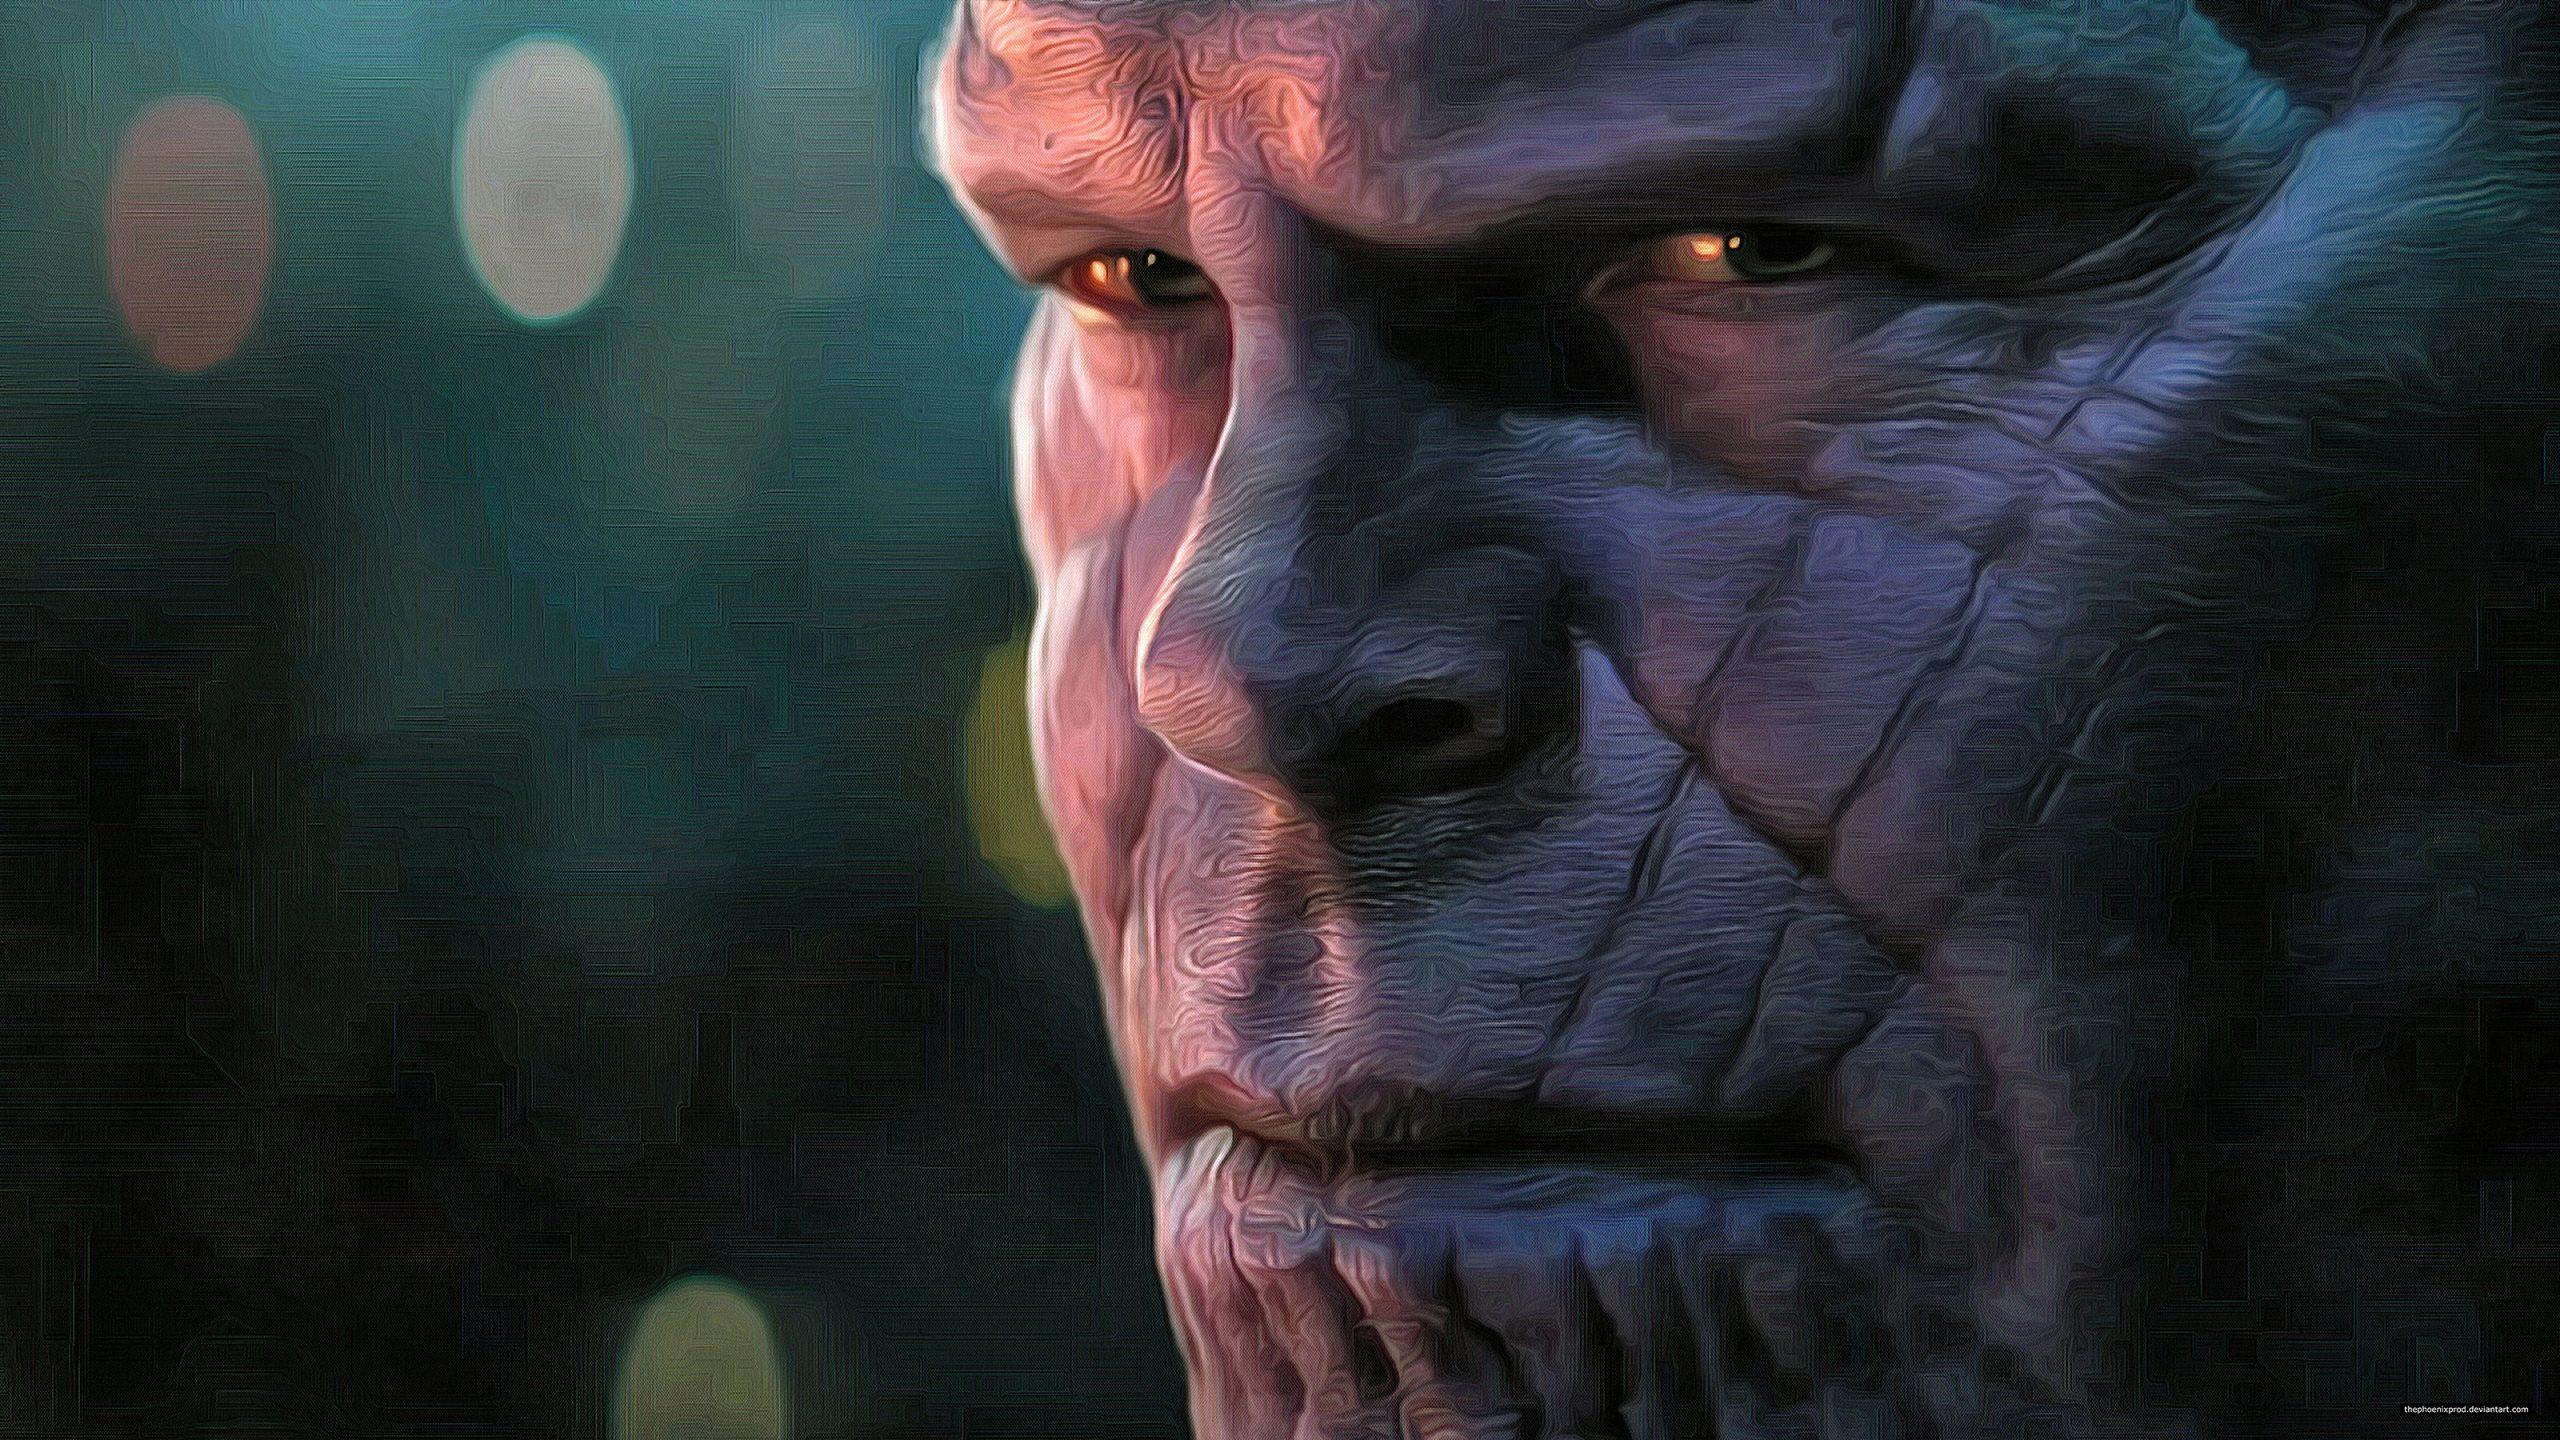 Avengers Infinity War 2018 Thanos 4k Uhd 3 2 3840x2560: Thanos Avengers Infinity War Artwork 4K Wallpaper